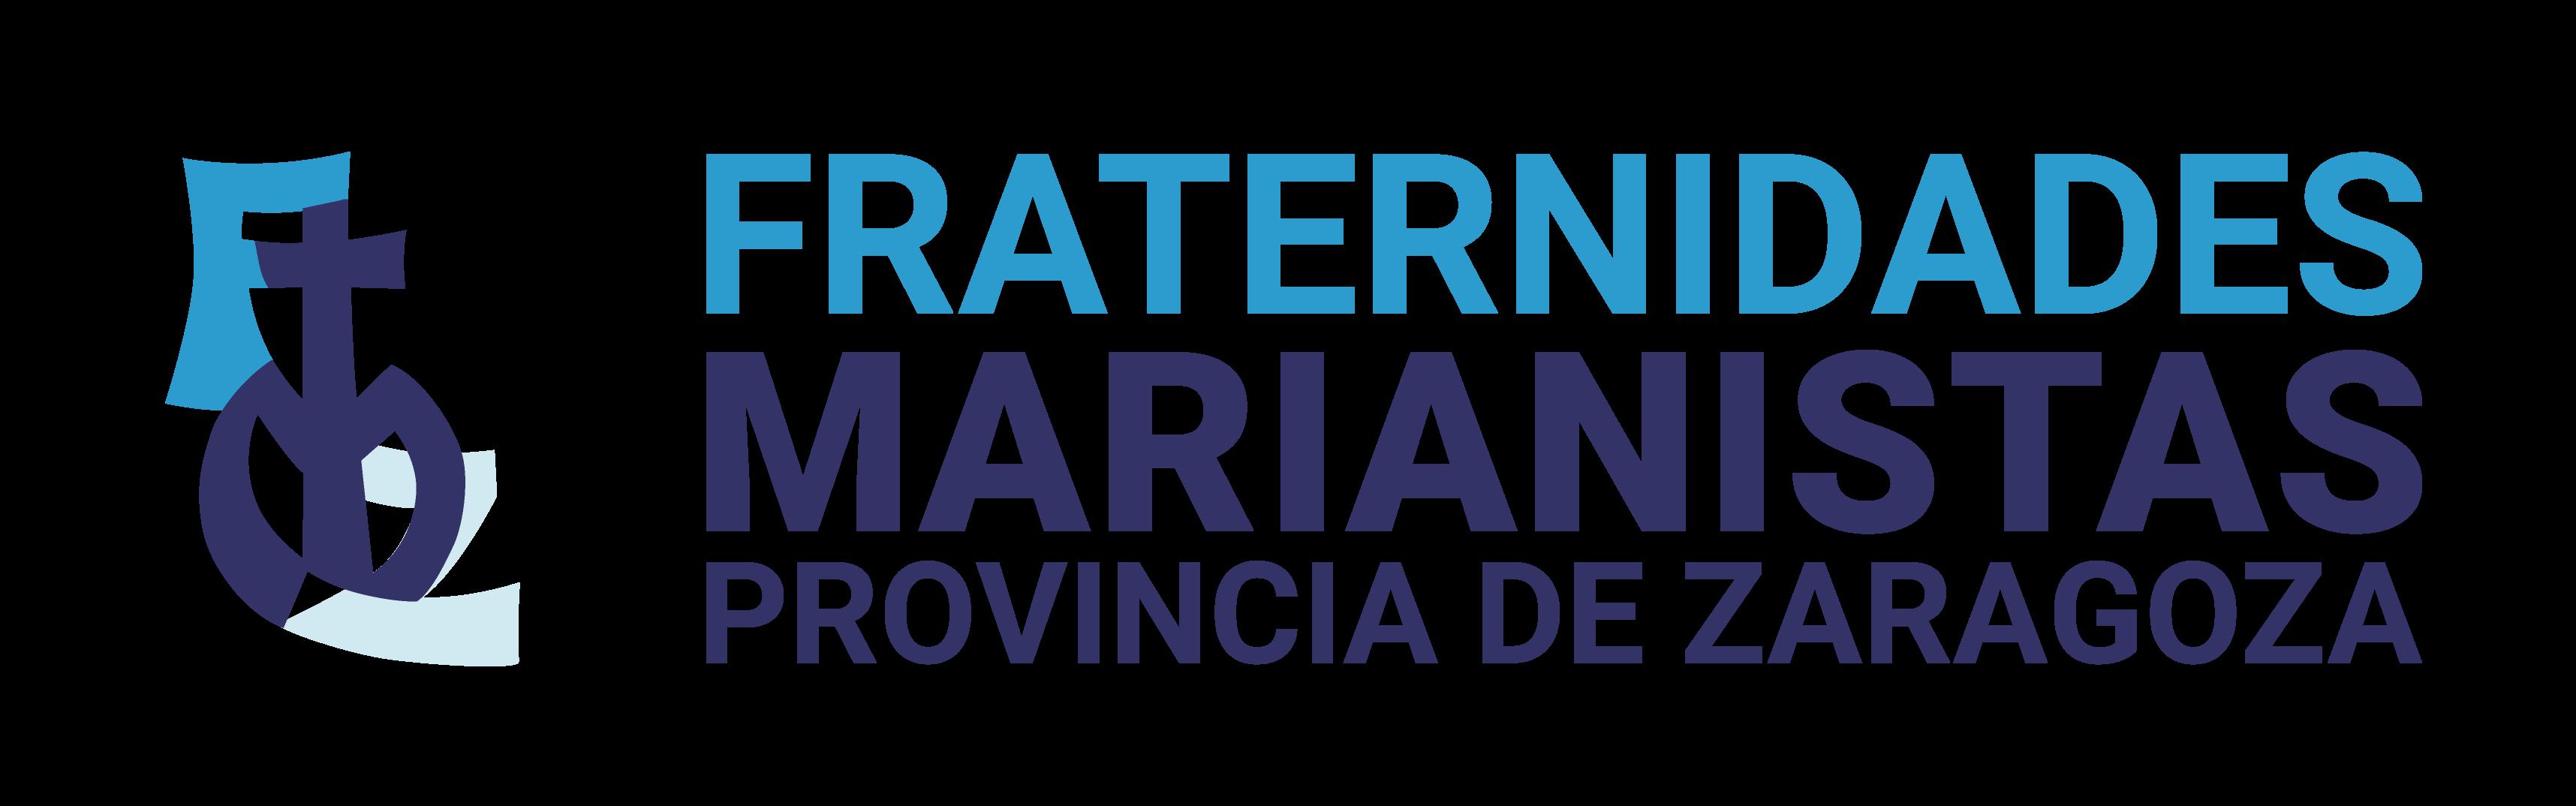 Fraternidades Marianistas Zaragoza